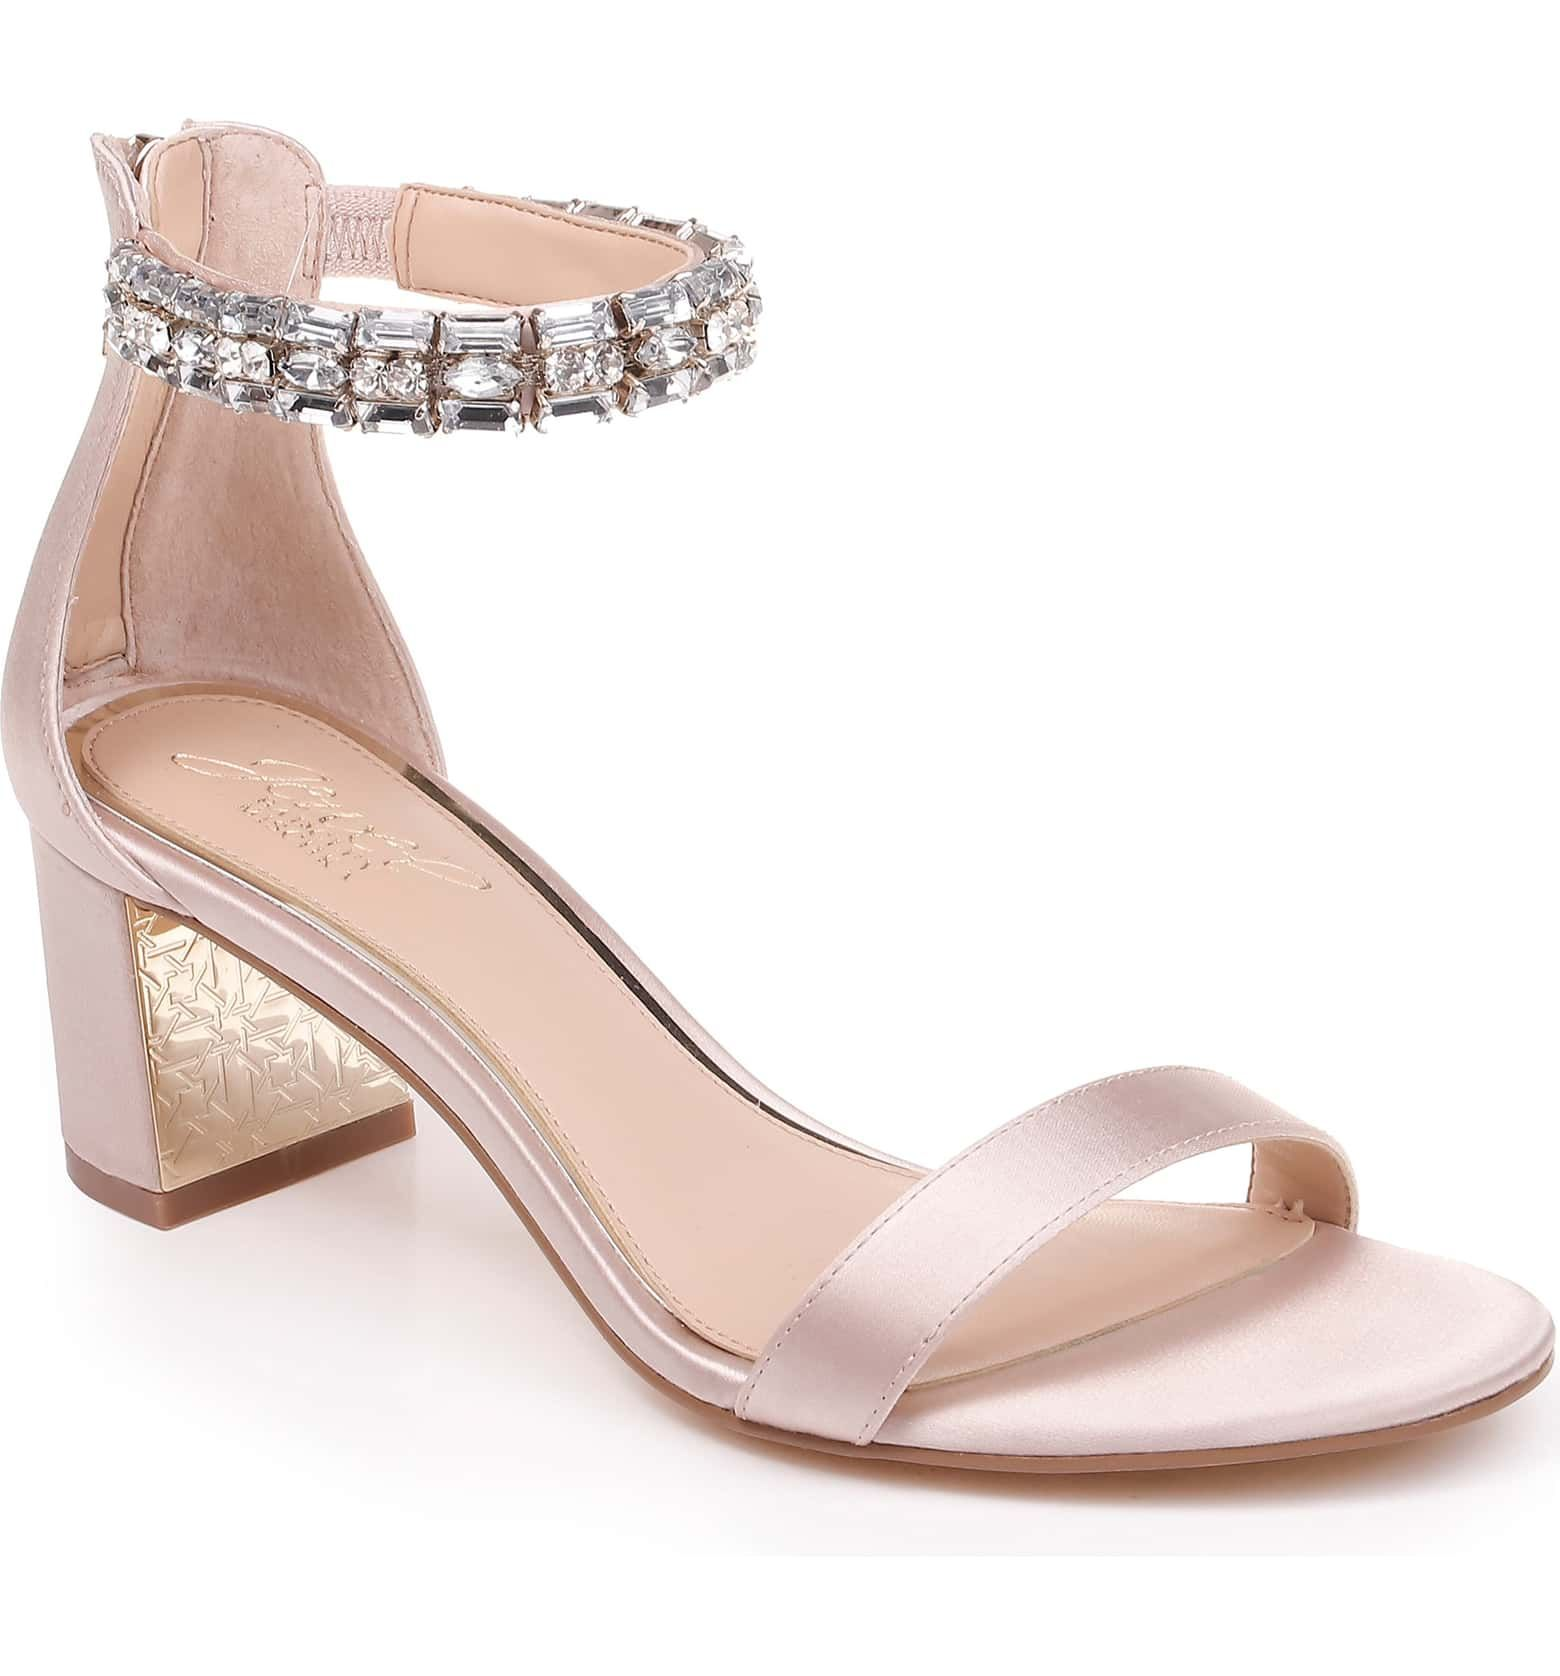 Katerina Ankle Strap Sandal Main Color Champagne Crystal Satin